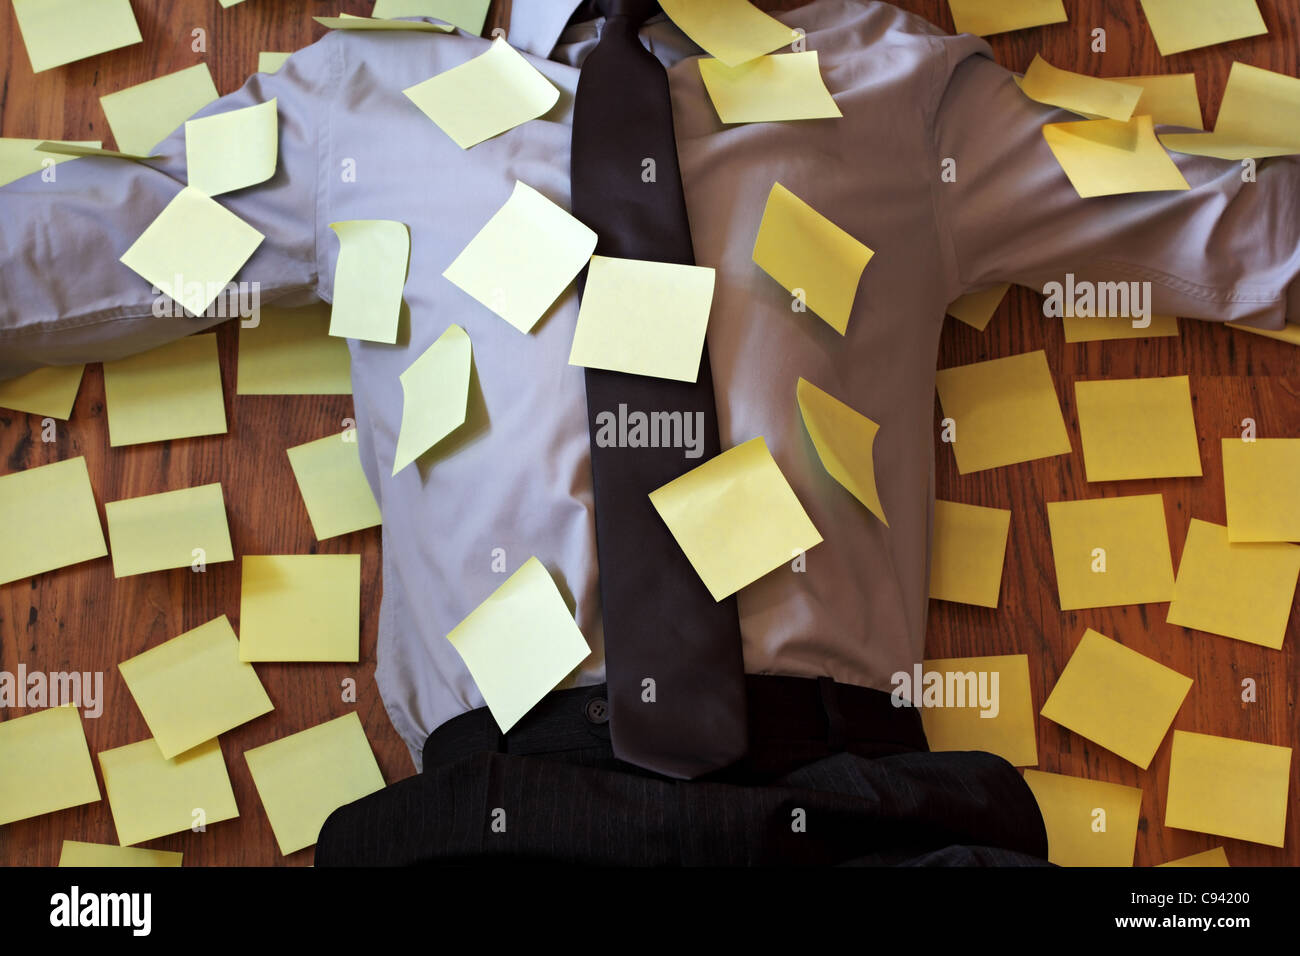 Adhesive note reminder overload - Stock Image